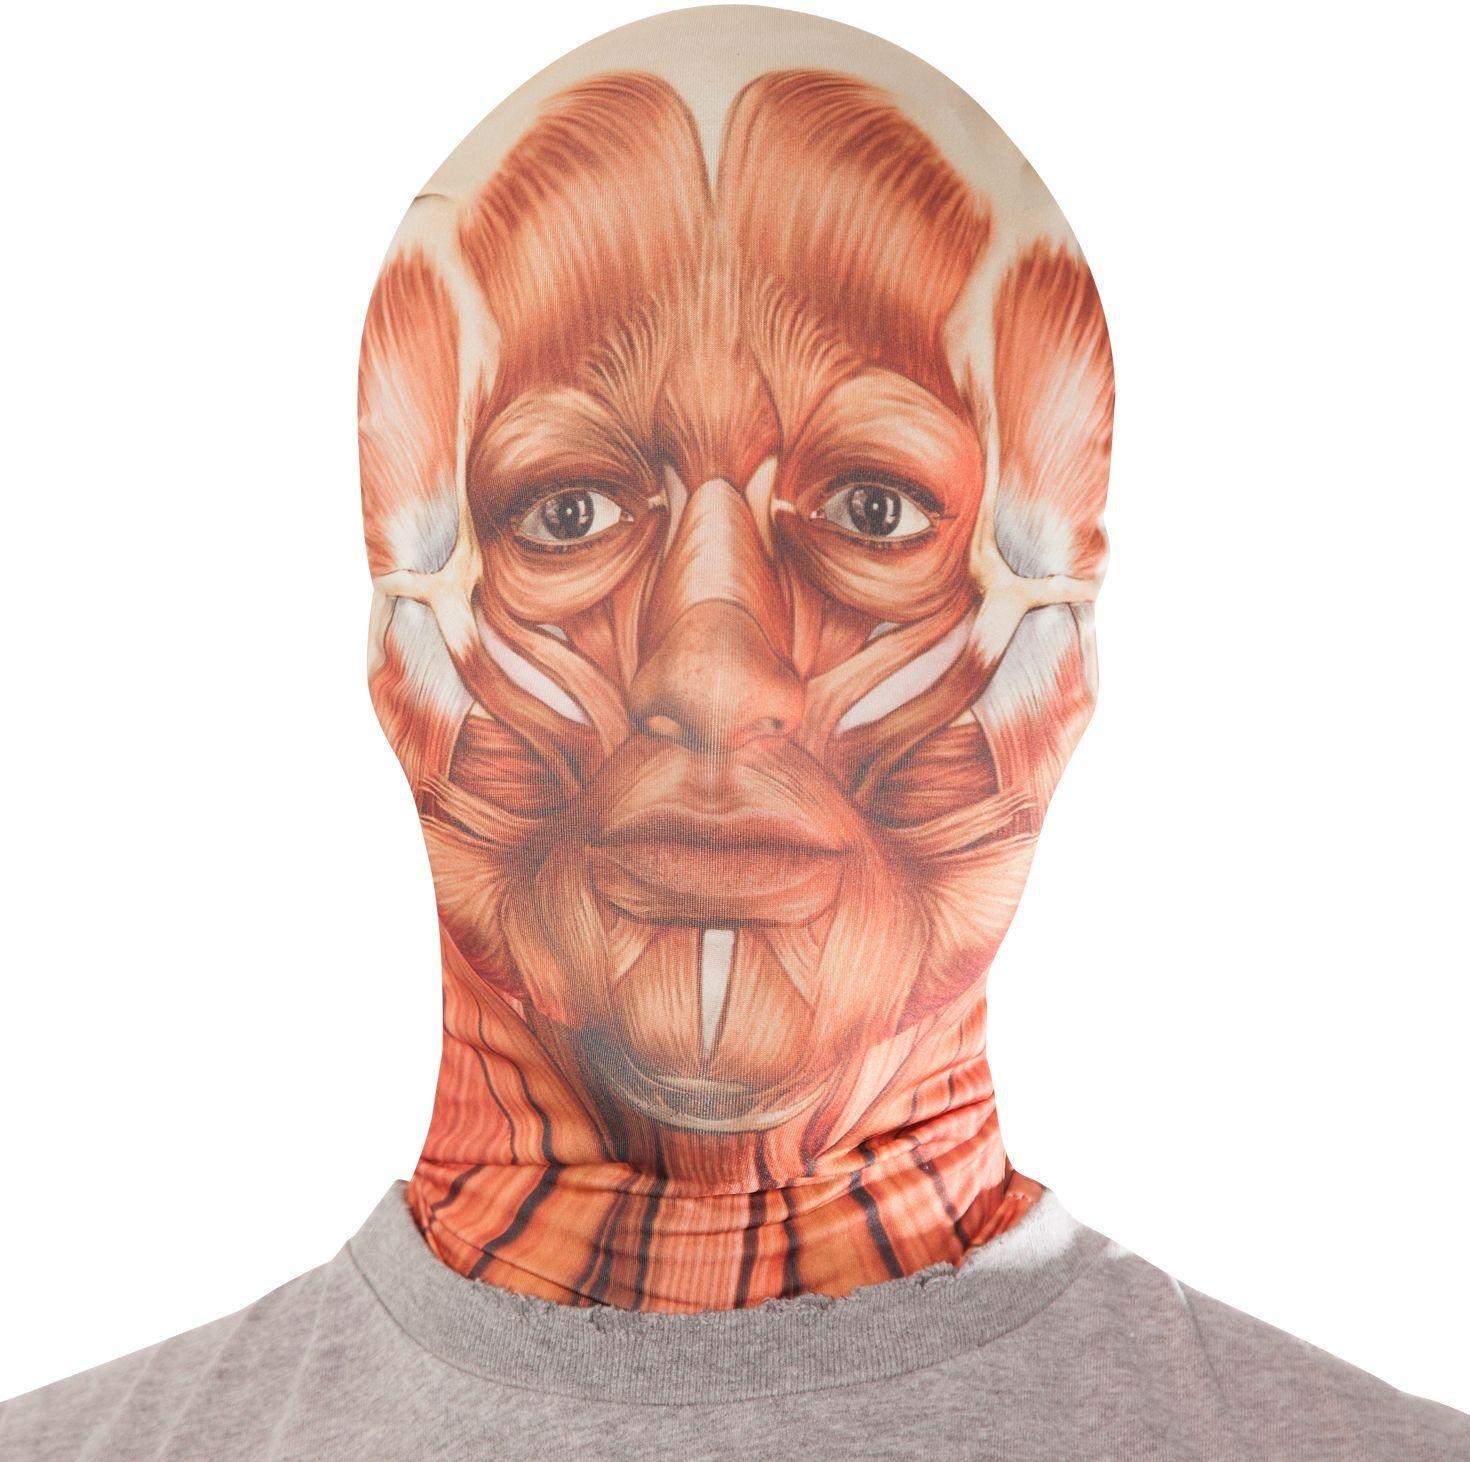 Image of Muscle Morph Mask.